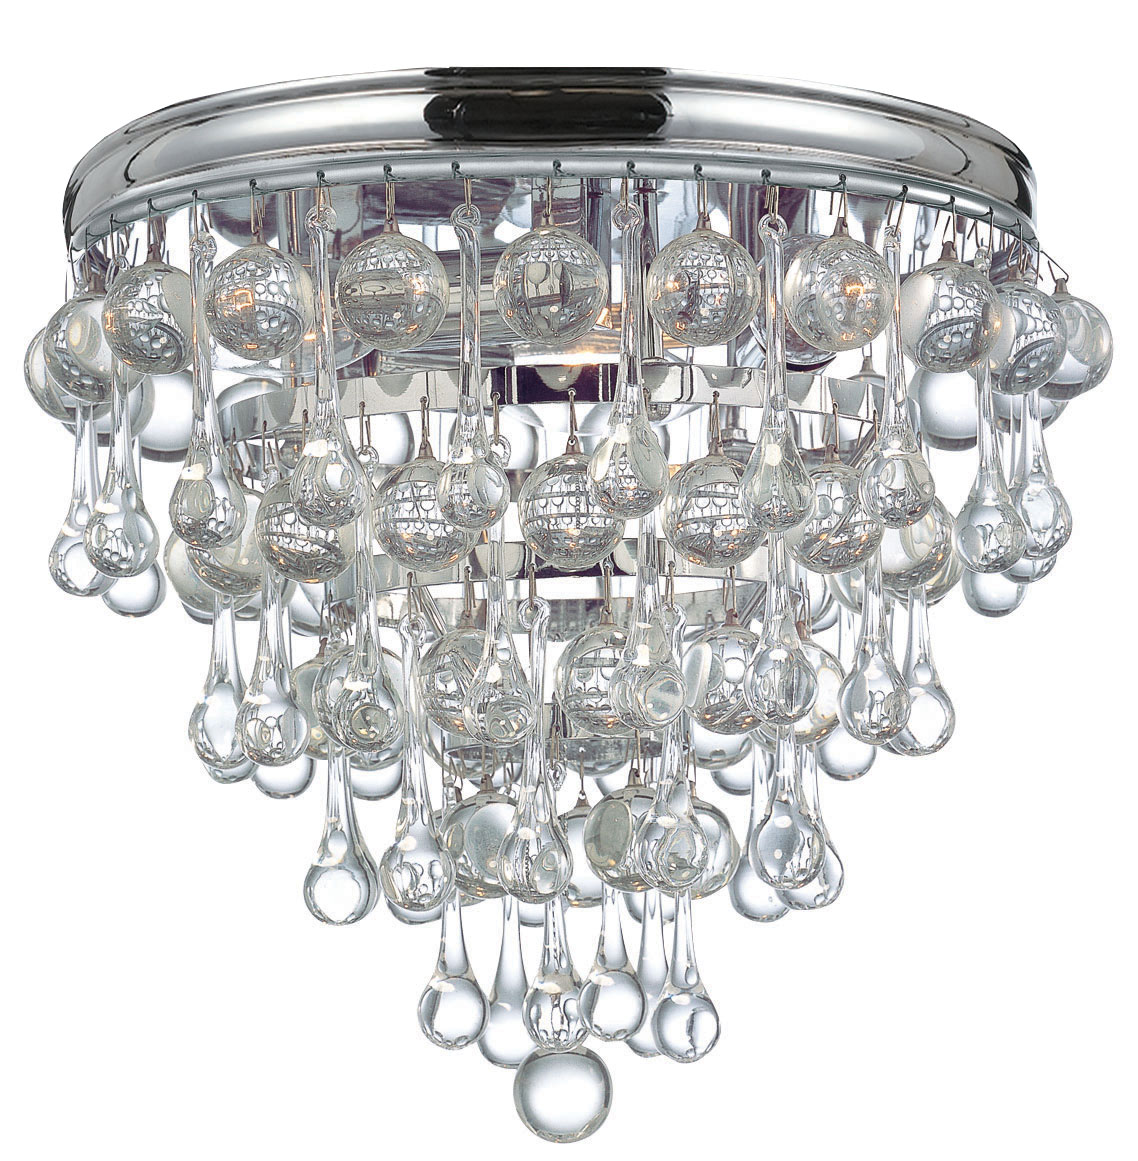 Calypso Ceiling Light Fixture By Crystorama 135 Ch